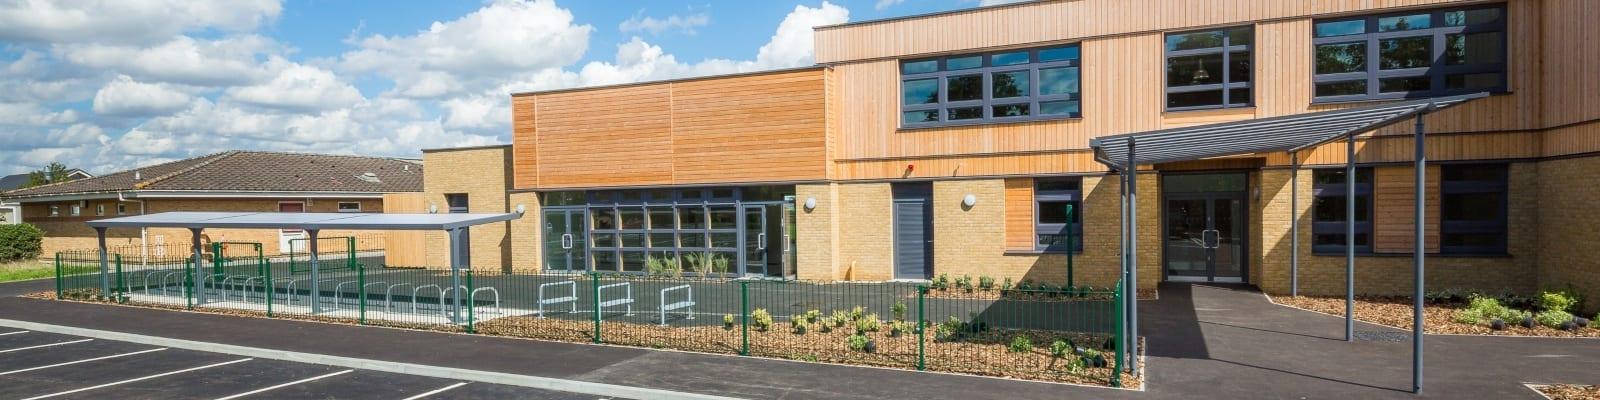 Simon Balle All Through School Shelters